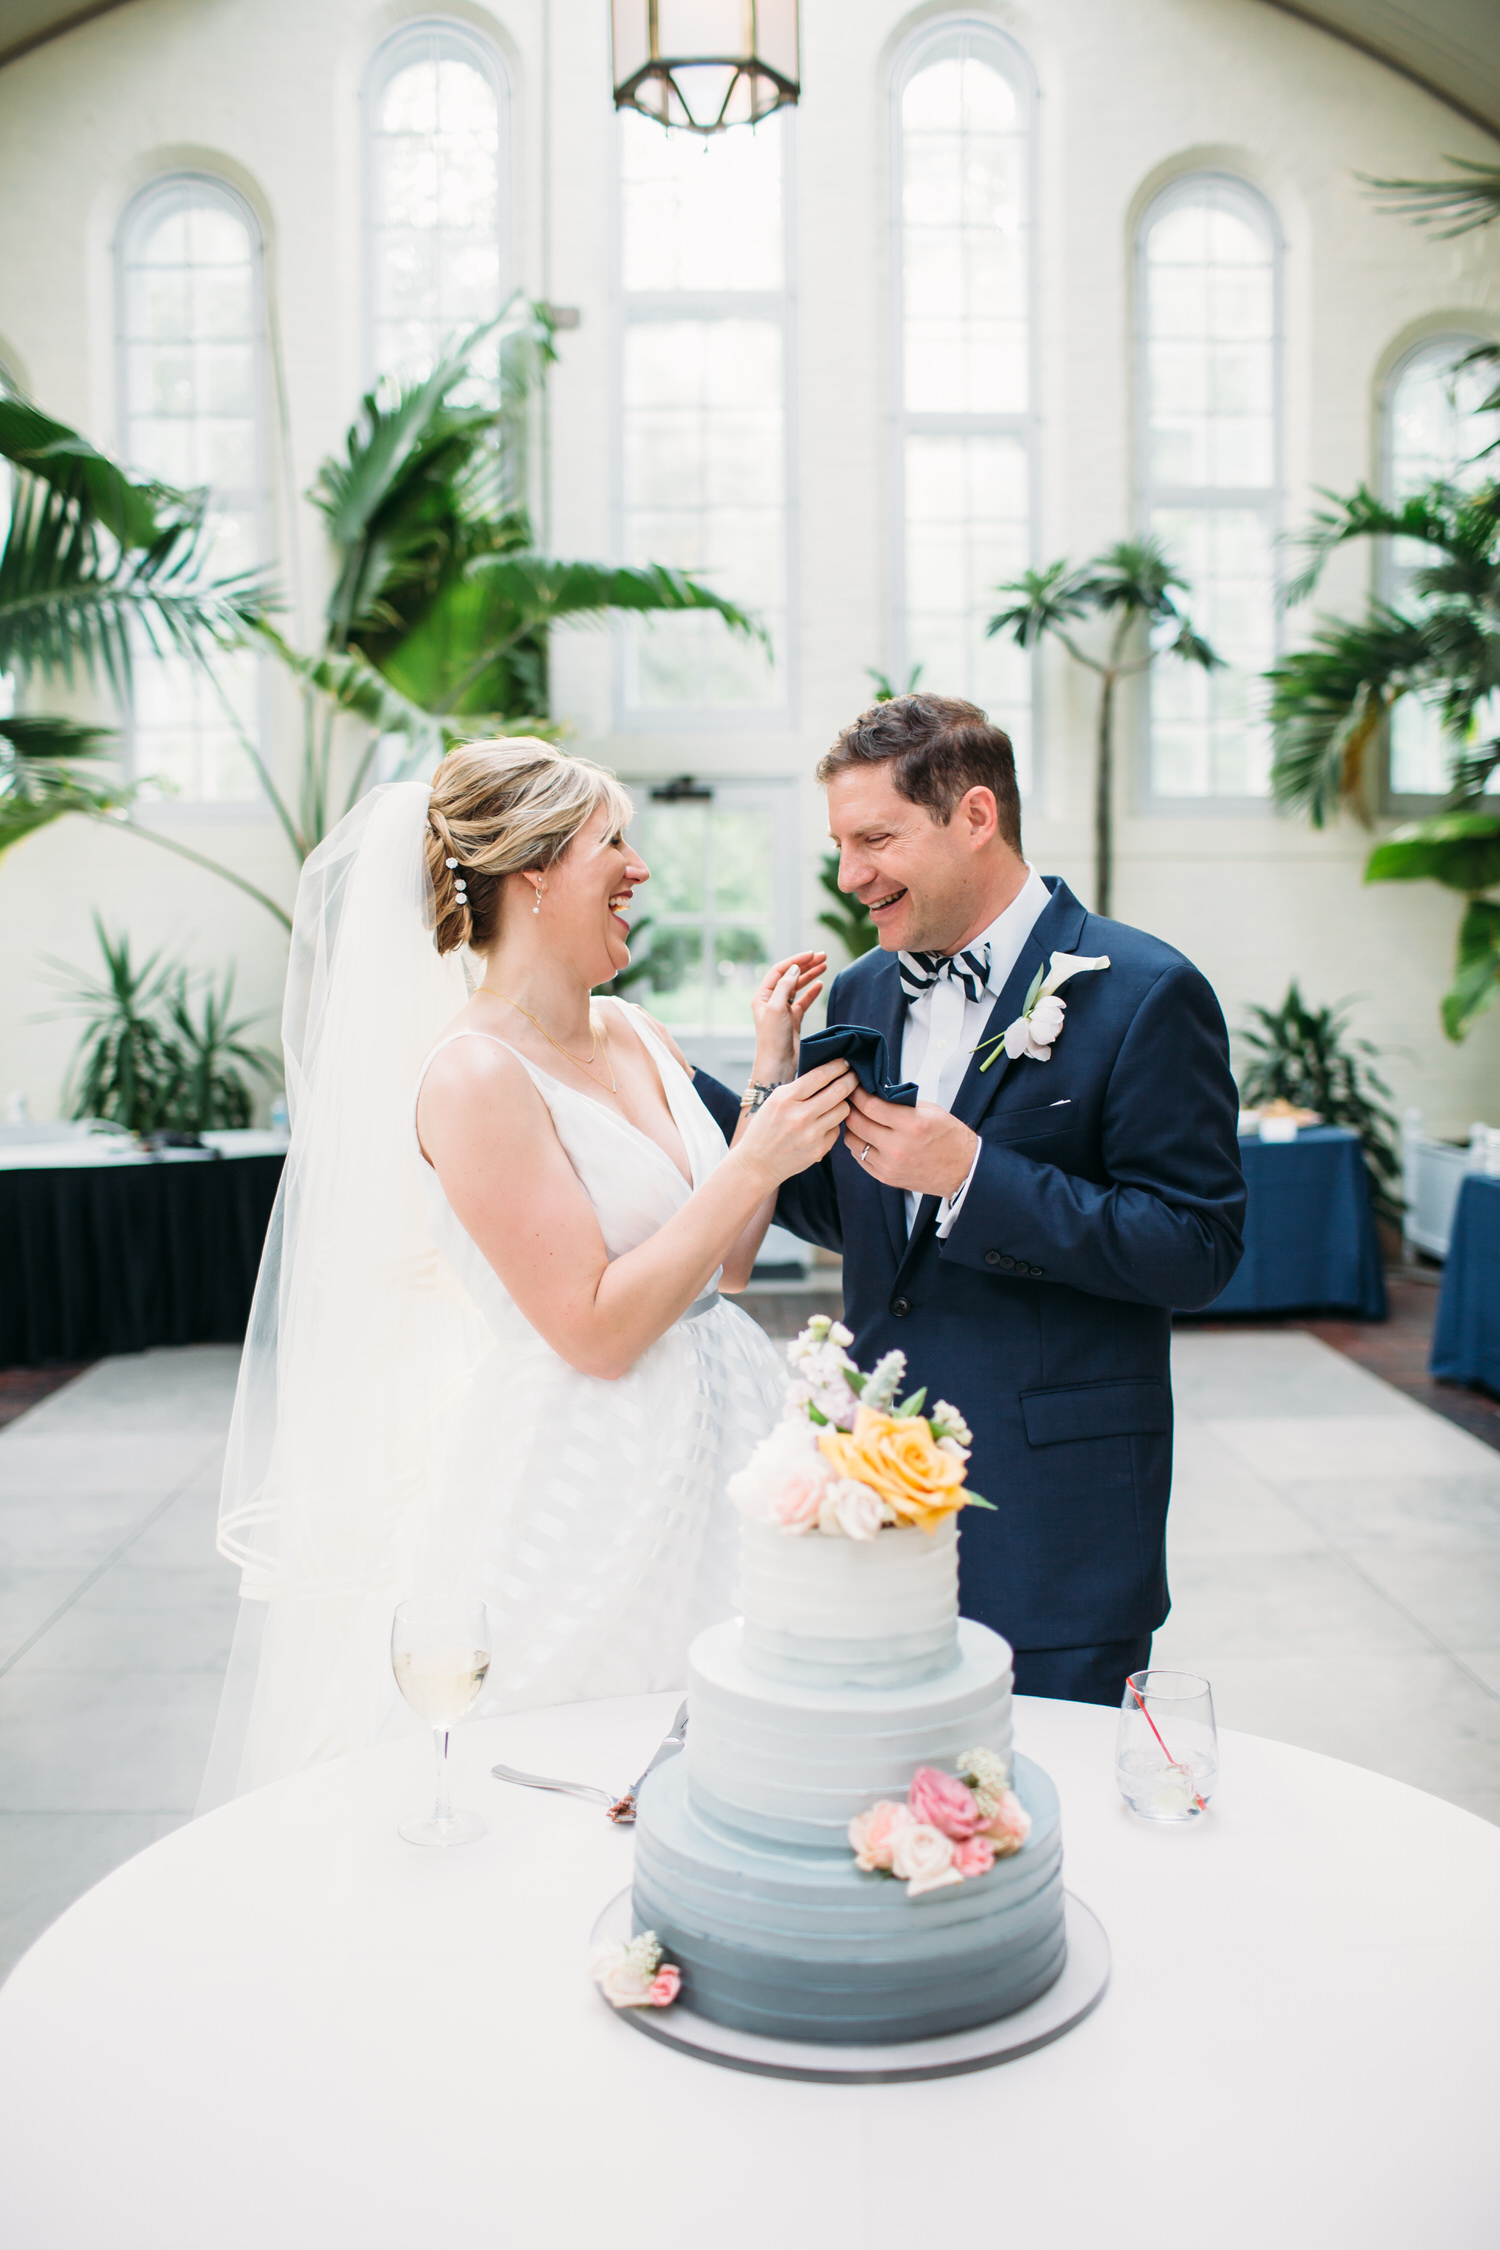 Cutting the cake, St Louis Wedding photographer